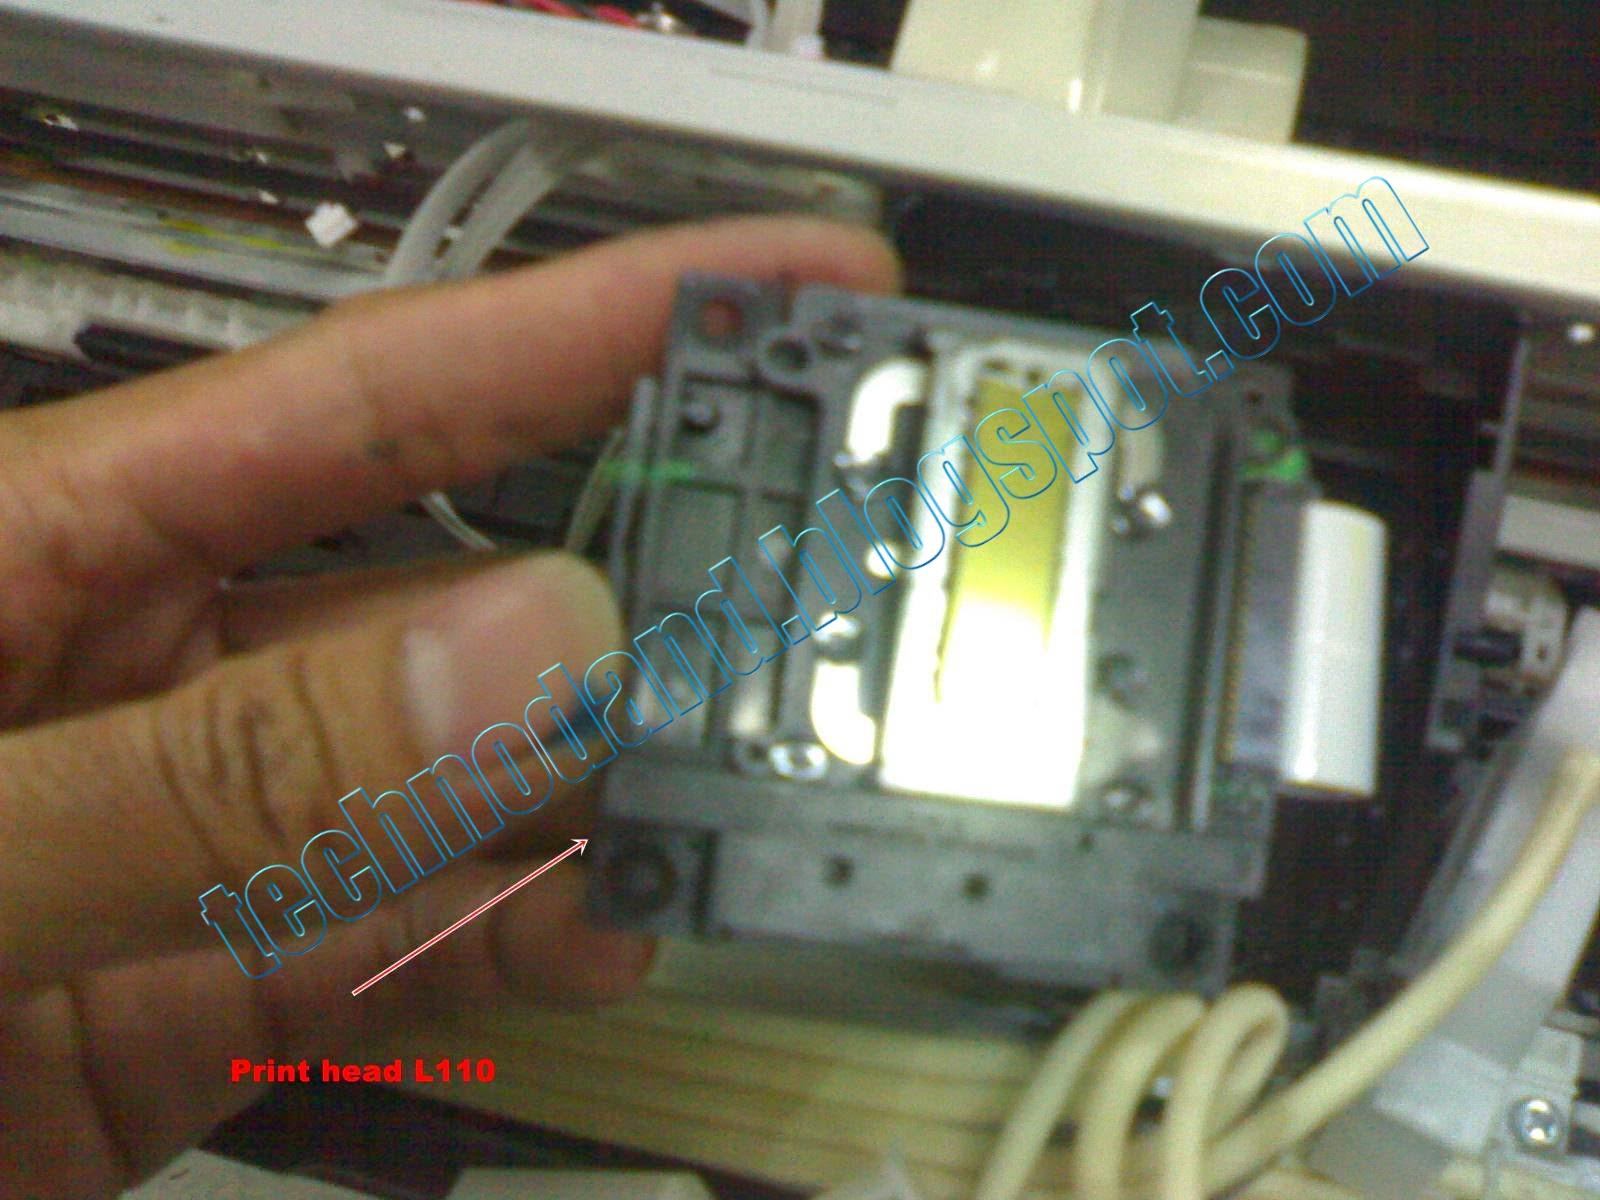 13 Epson Printer L310 Hitam Print C5efef36 Epson  : L110 13 from cekhargaonline.com size 1600 x 1200 jpeg 763kB